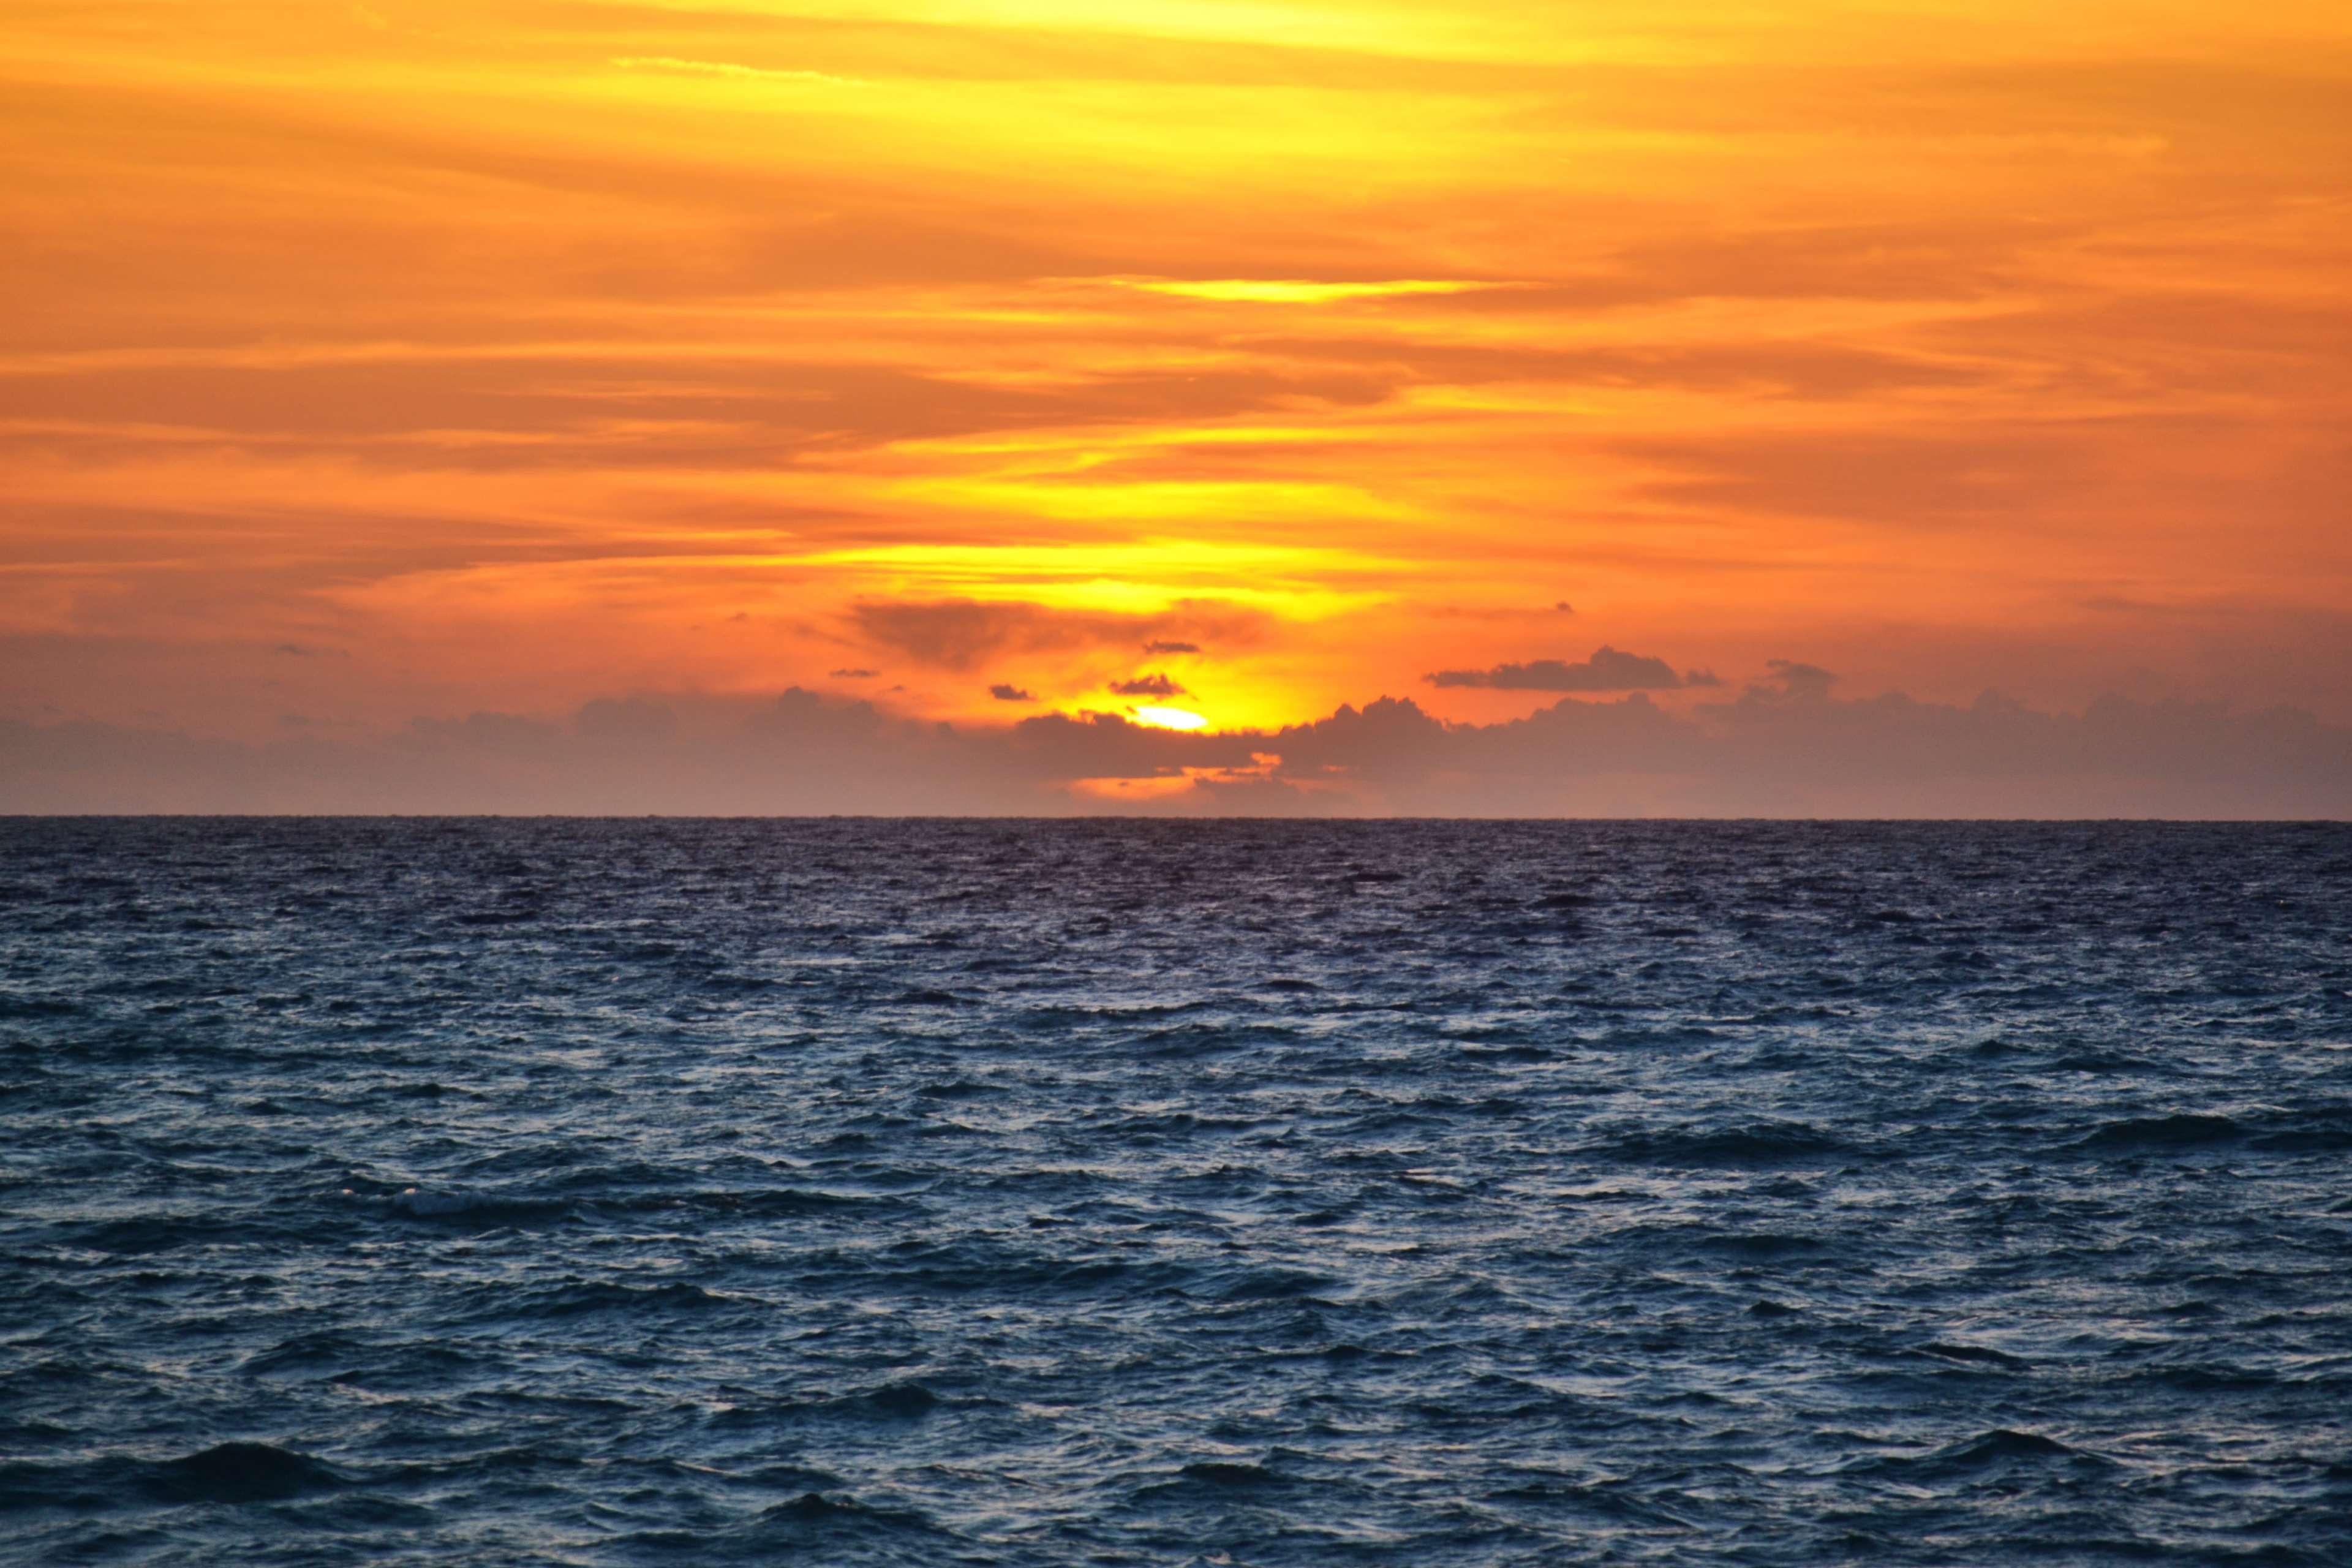 Dawn Dusk Evening Greece Horizon Island Landscape Ocean Orange Outdoor Peaceful Reflection Scenic Sea Seasc Sunrise Sunset Sunrise Images Sunset